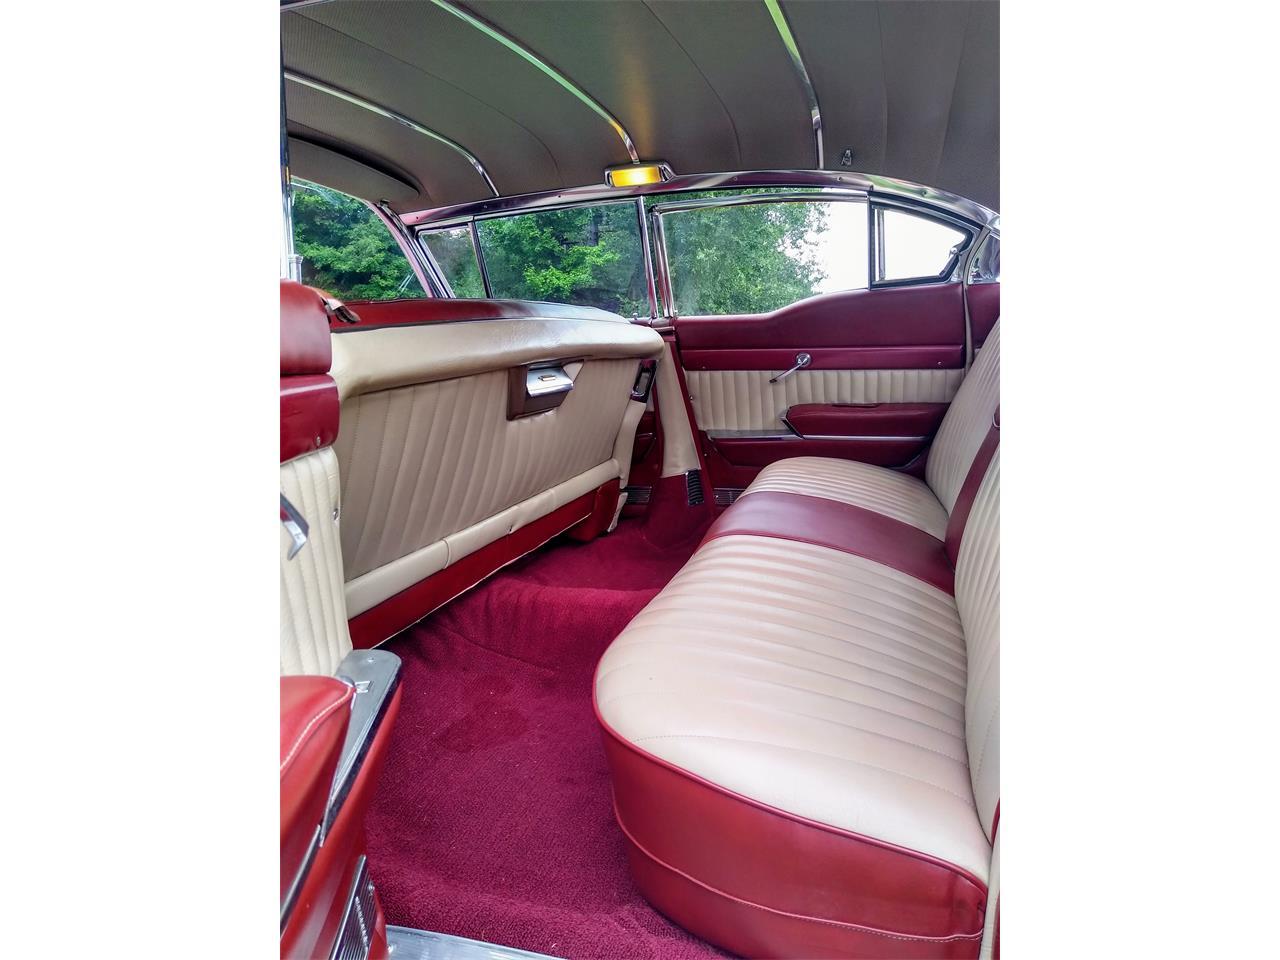 1958 Cadillac Sedan DeVille (CC-1387382) for sale in Cochranton, Pennsylvania